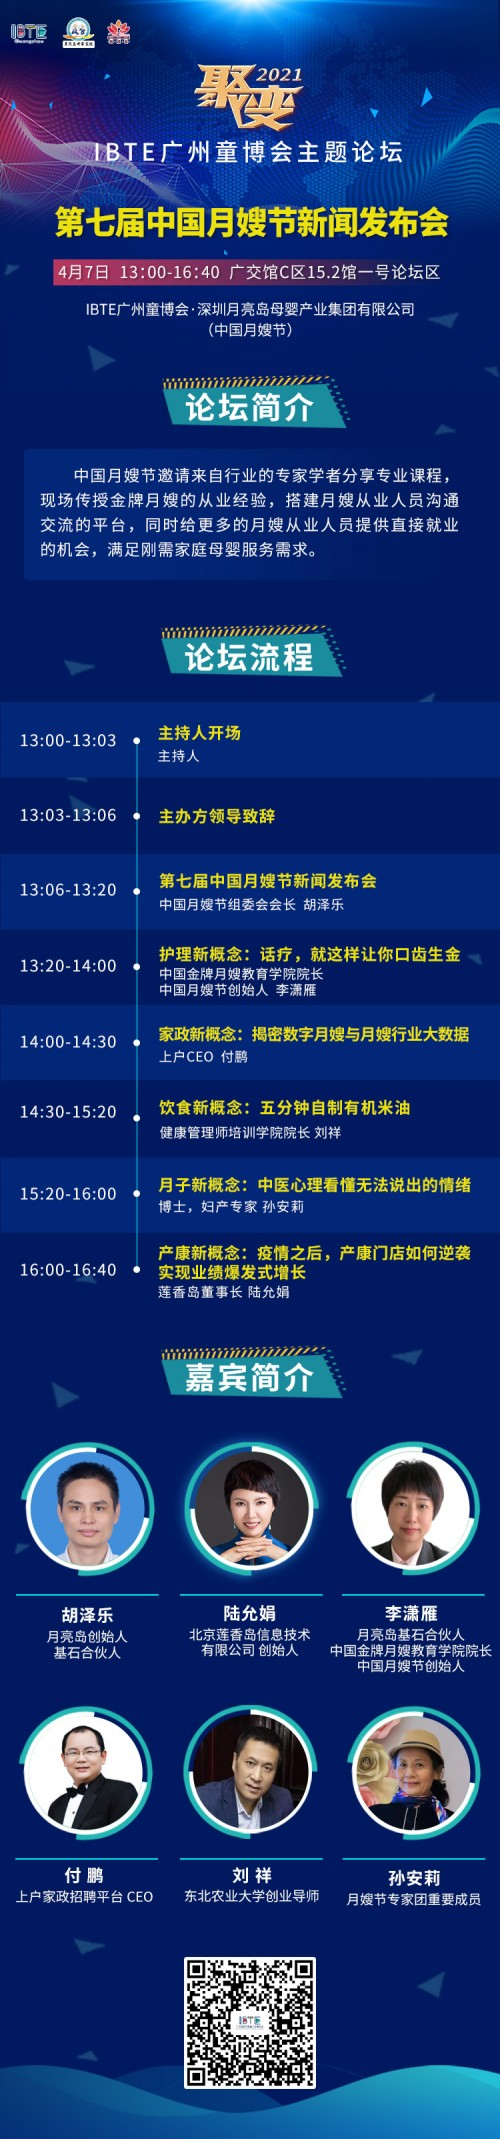 IBTE广州孕婴童博览会活动峰会完整版曝光